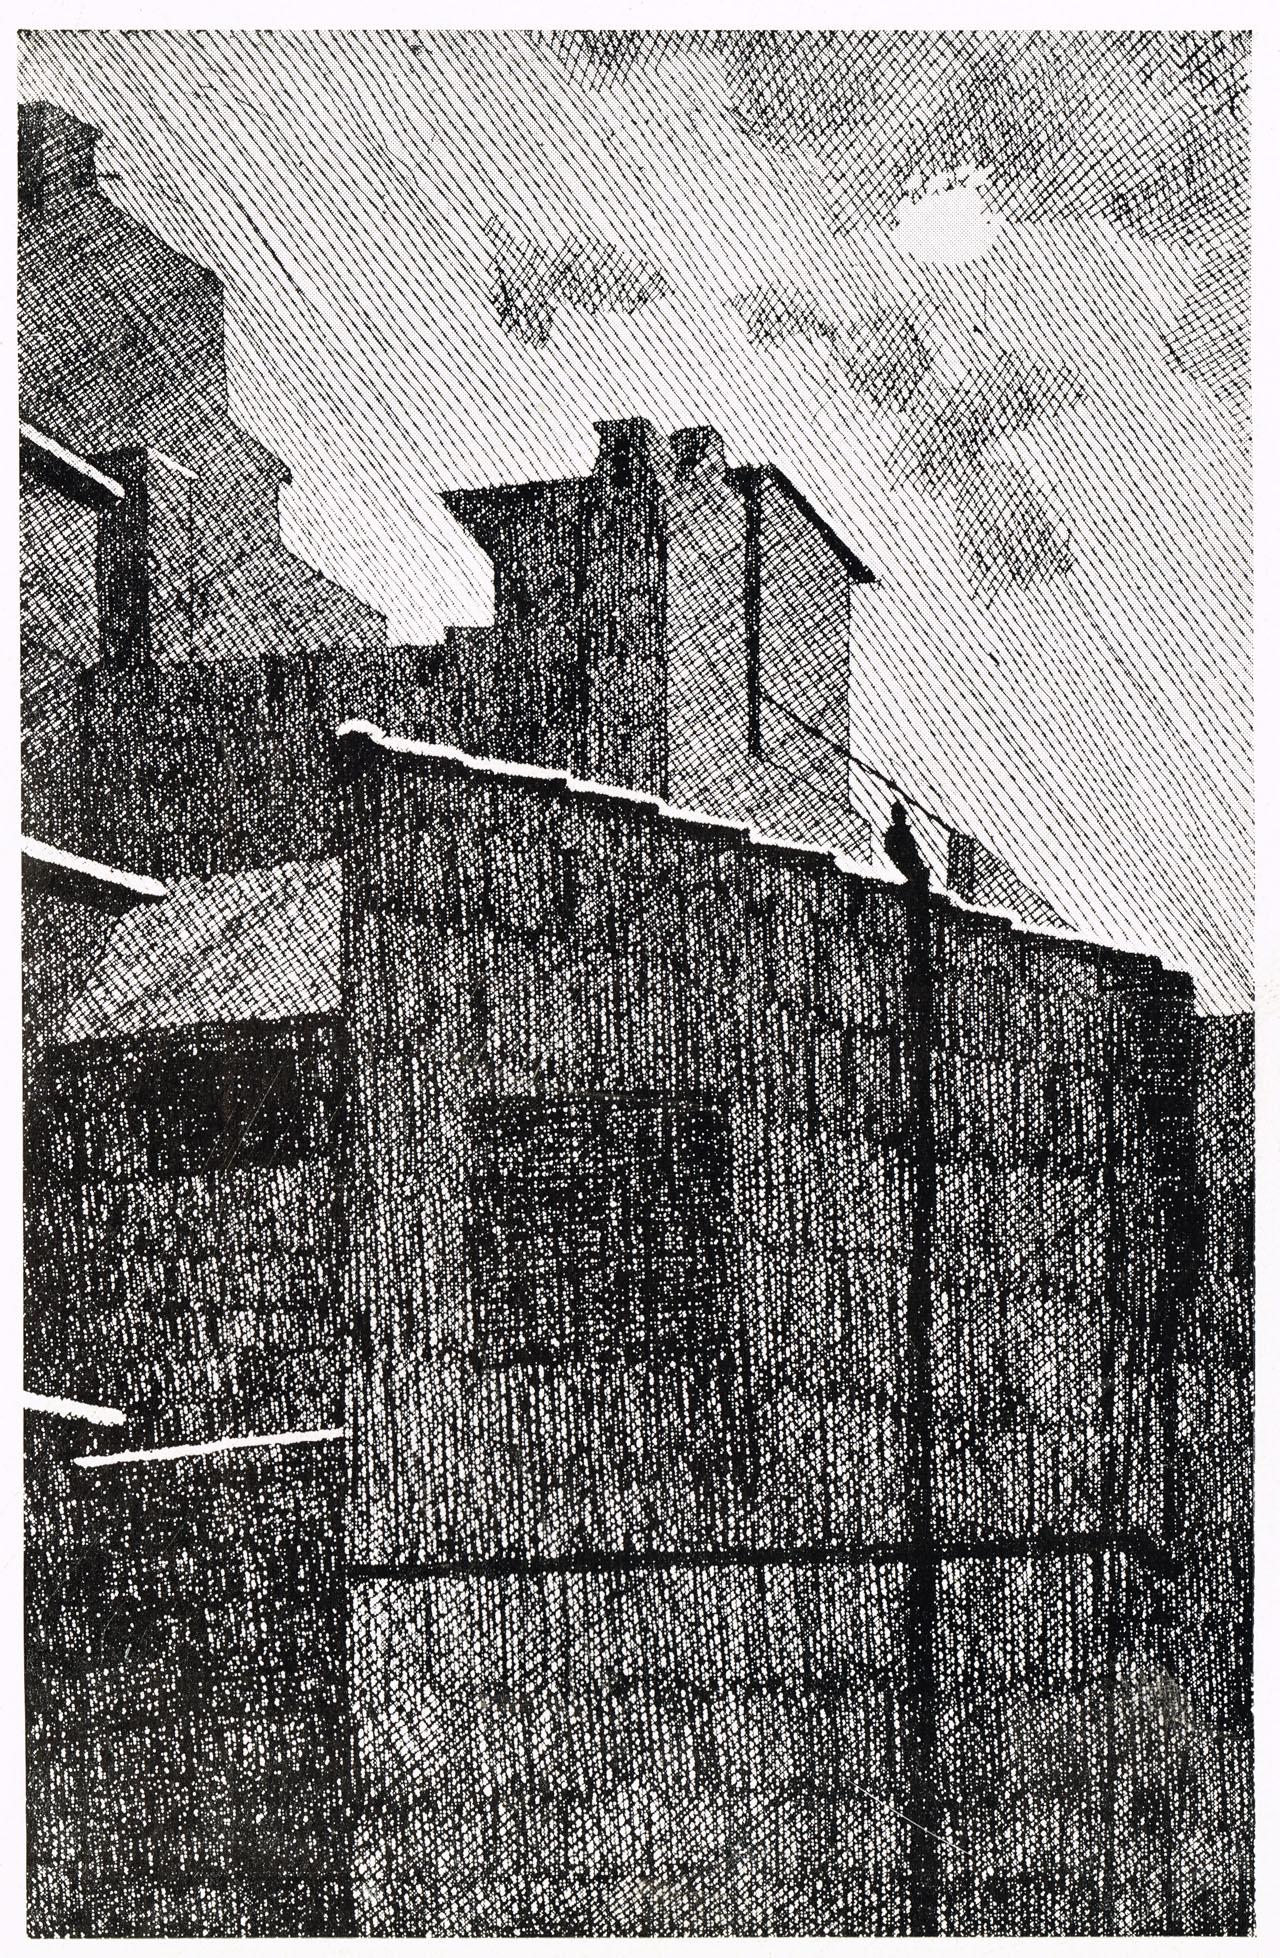 1956 Exhibition %22Rami Nella Luce%22.jpg